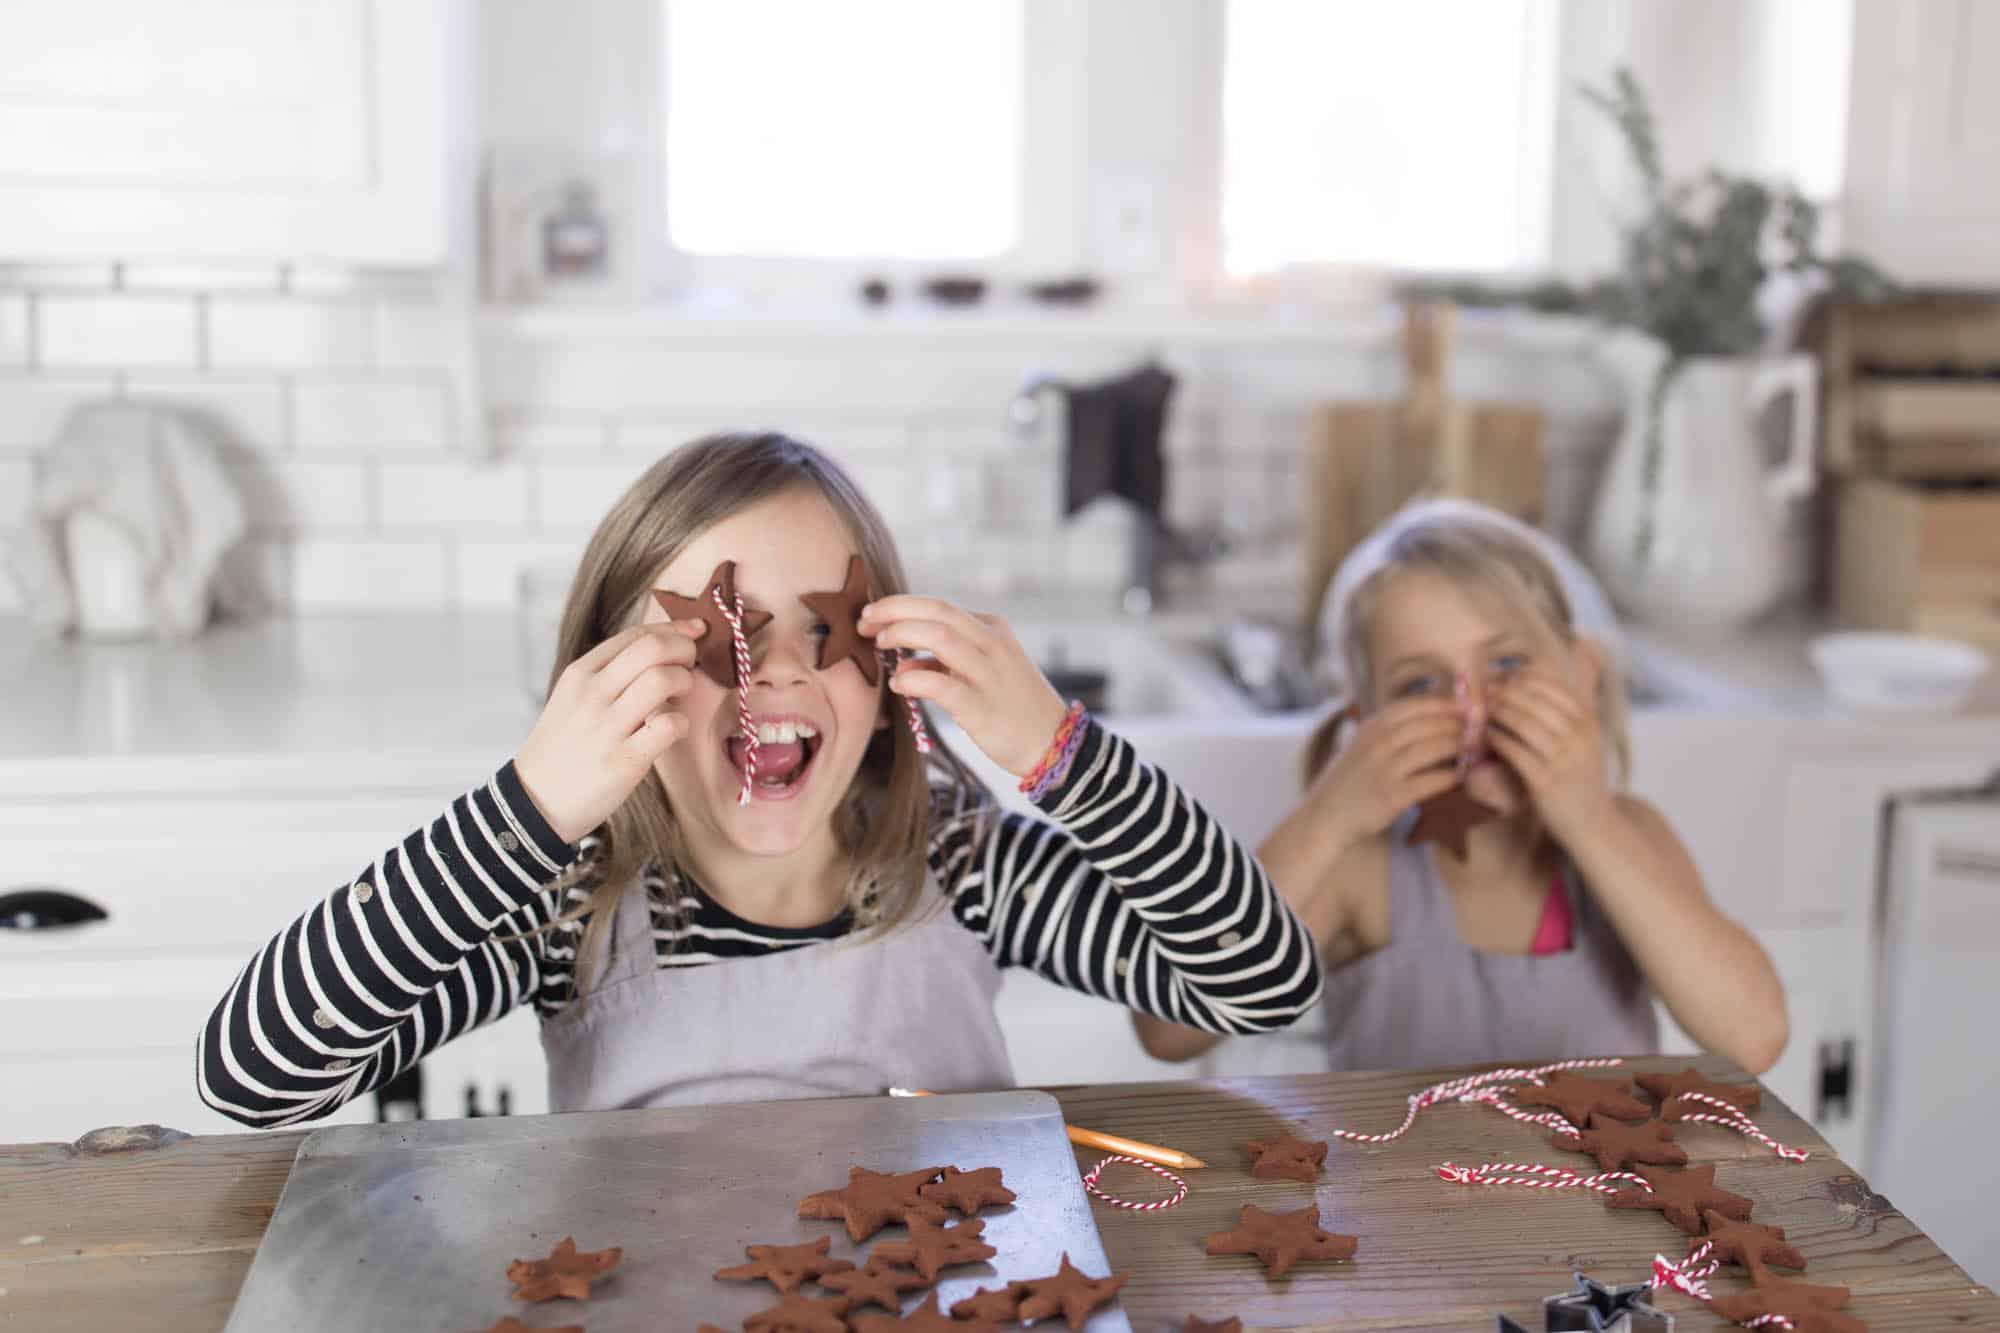 DIY Applesauce Cinnamon Ornaments Homemade Christmas Decorations with Kids